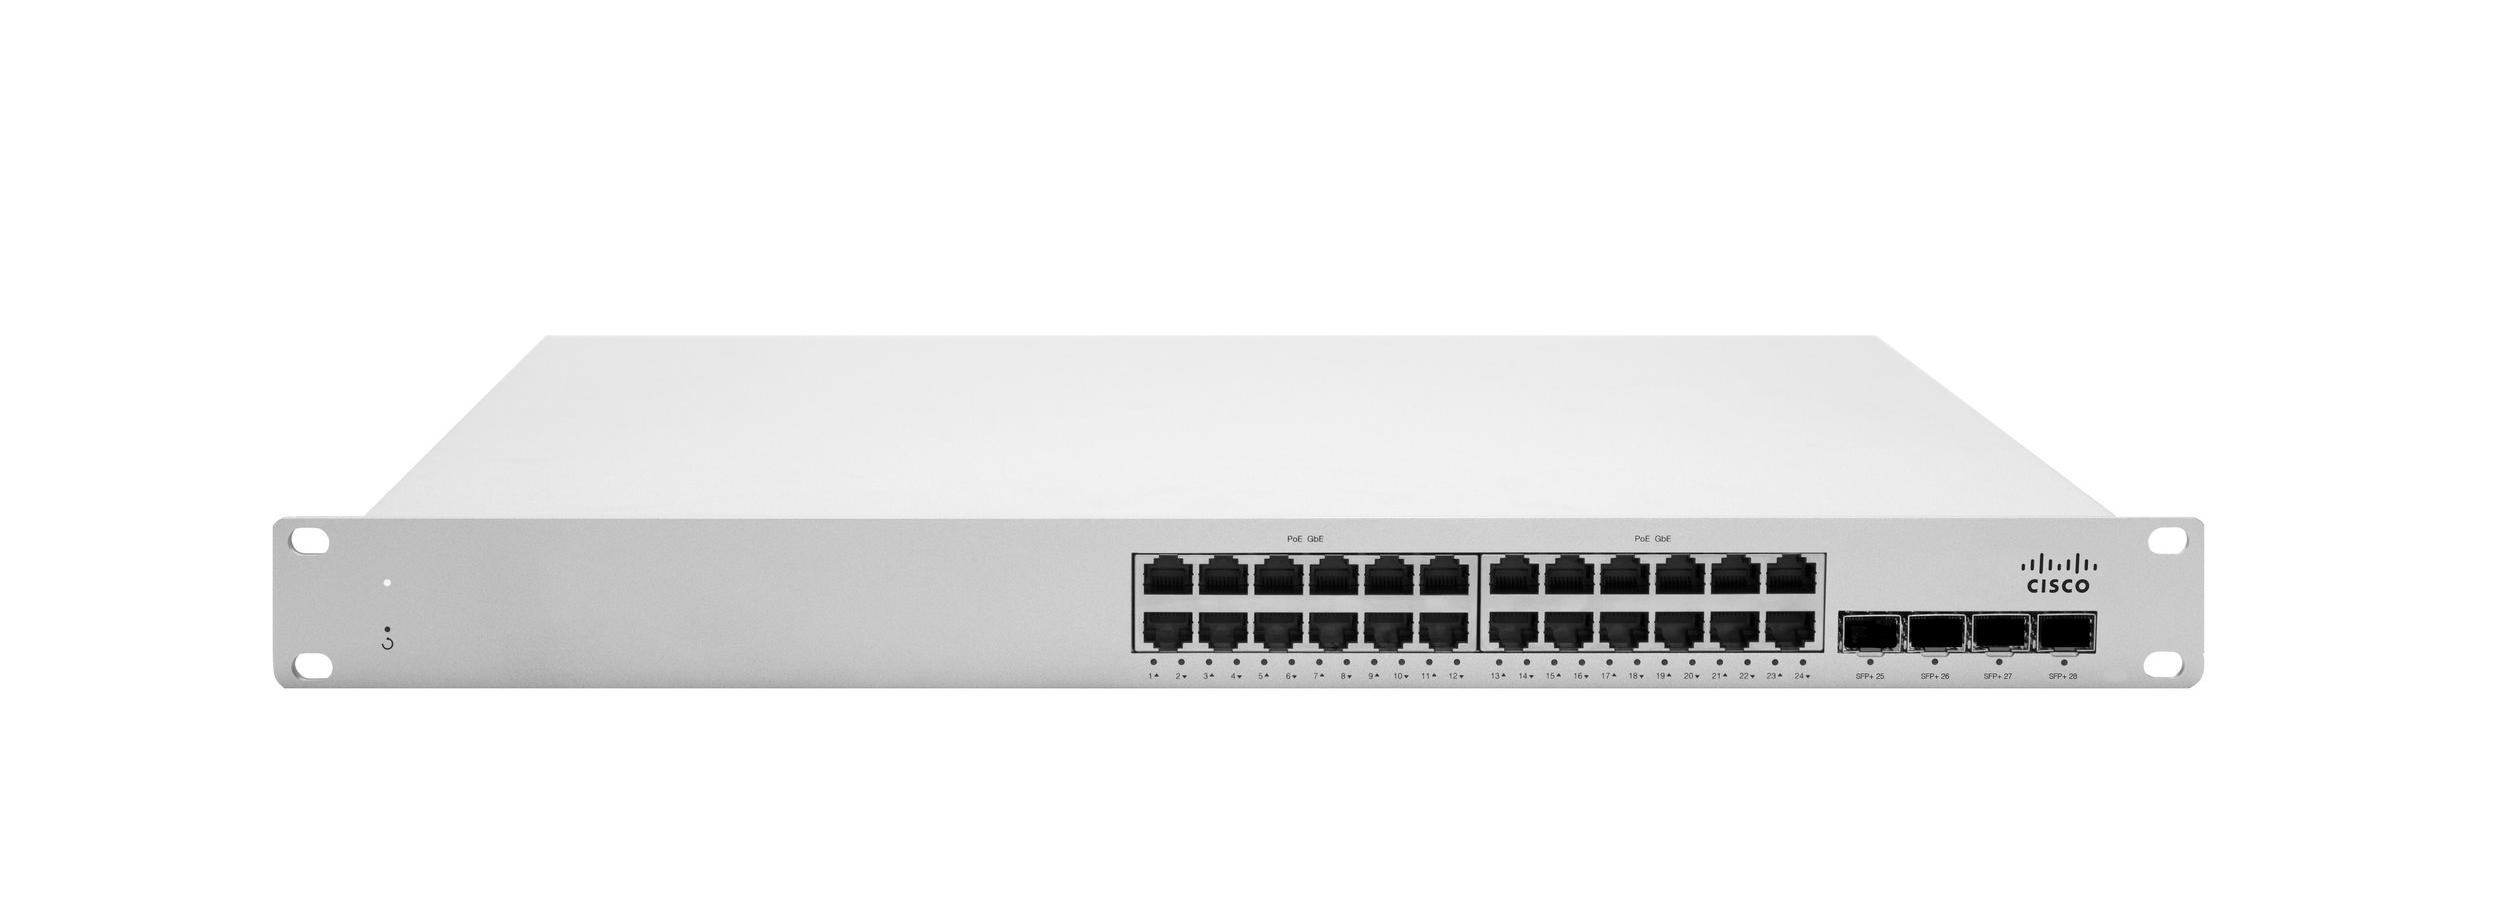 Cisco Meraki Stackable Access Switch S225-24